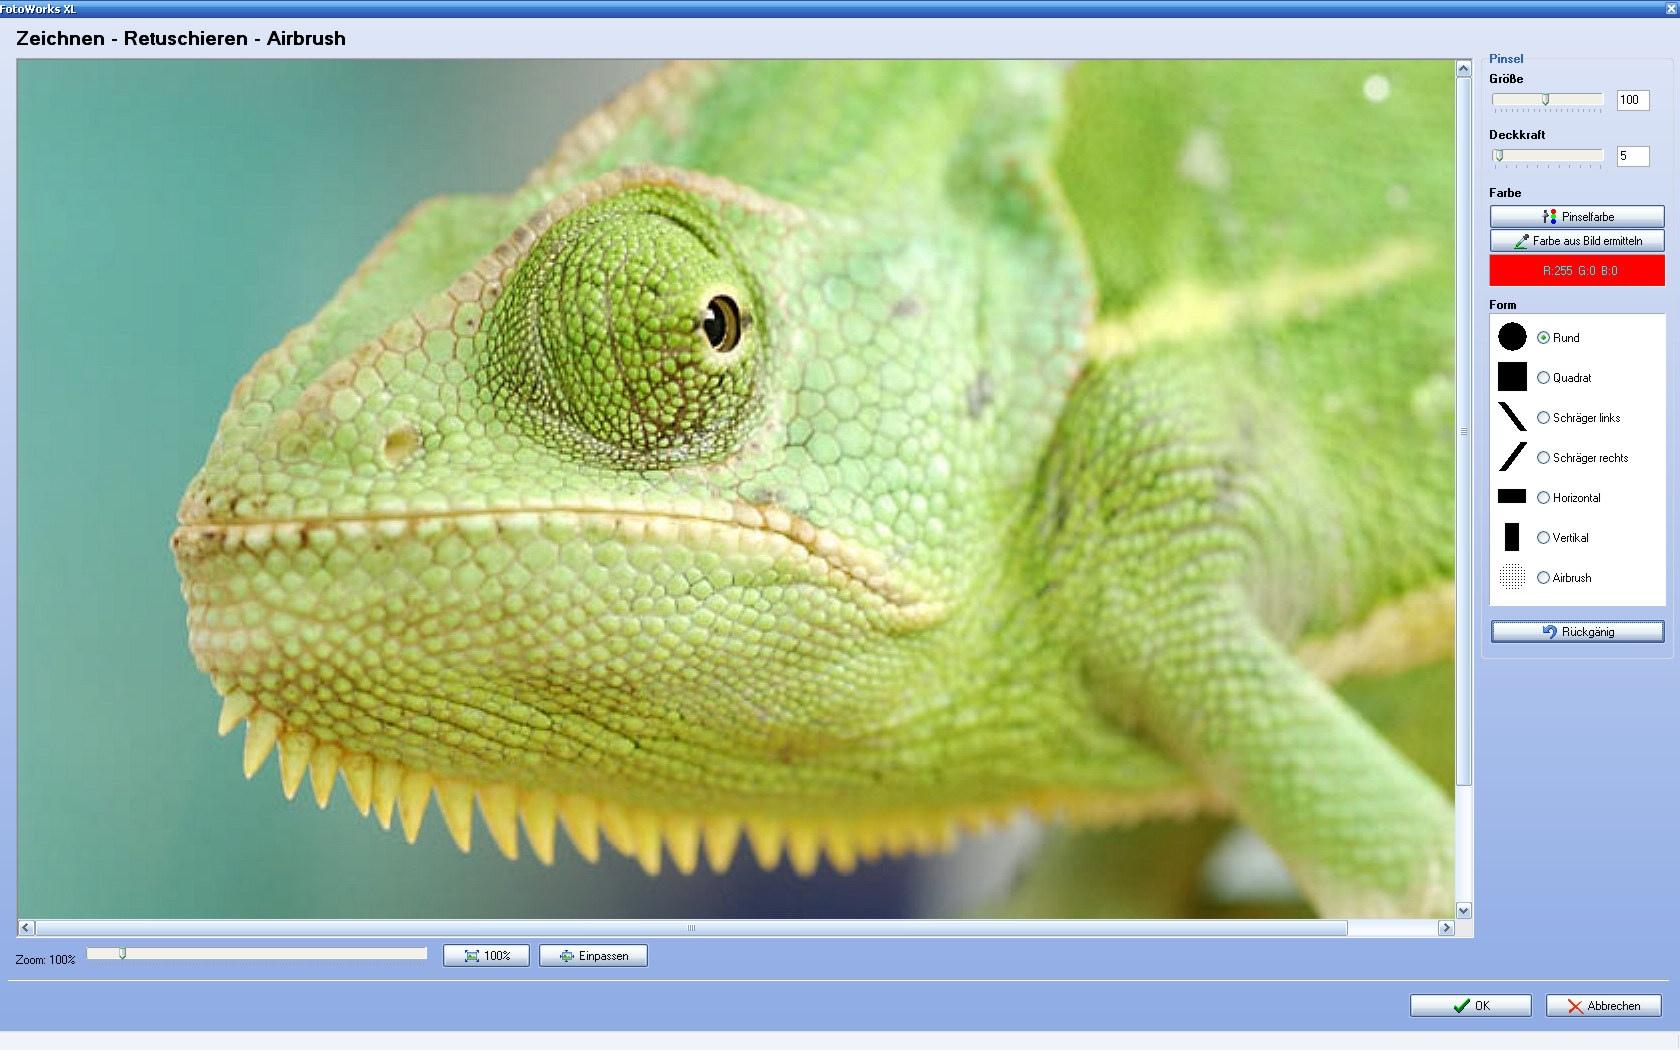 Fotobearbeitungssoftware Windows 10